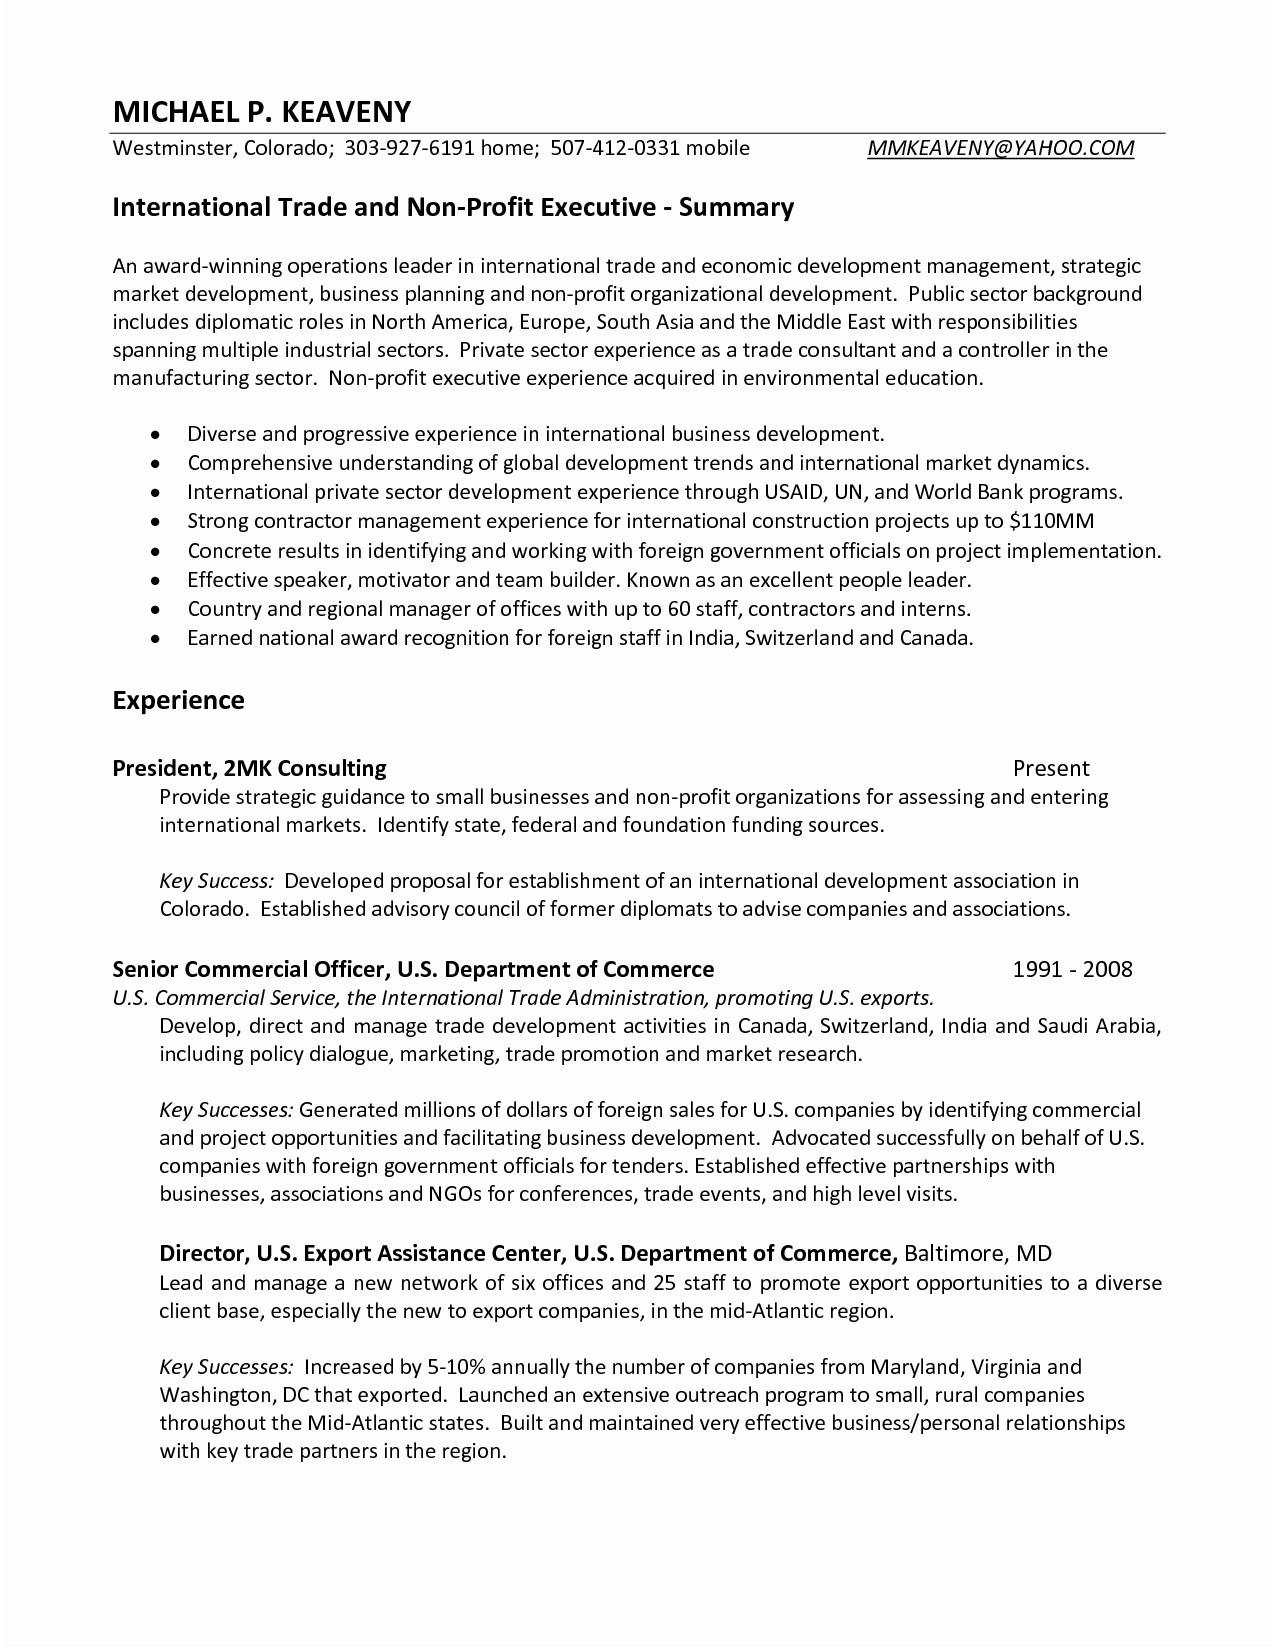 Student Cv Summary Sample Luxus Resume Business Economics New American Of 45